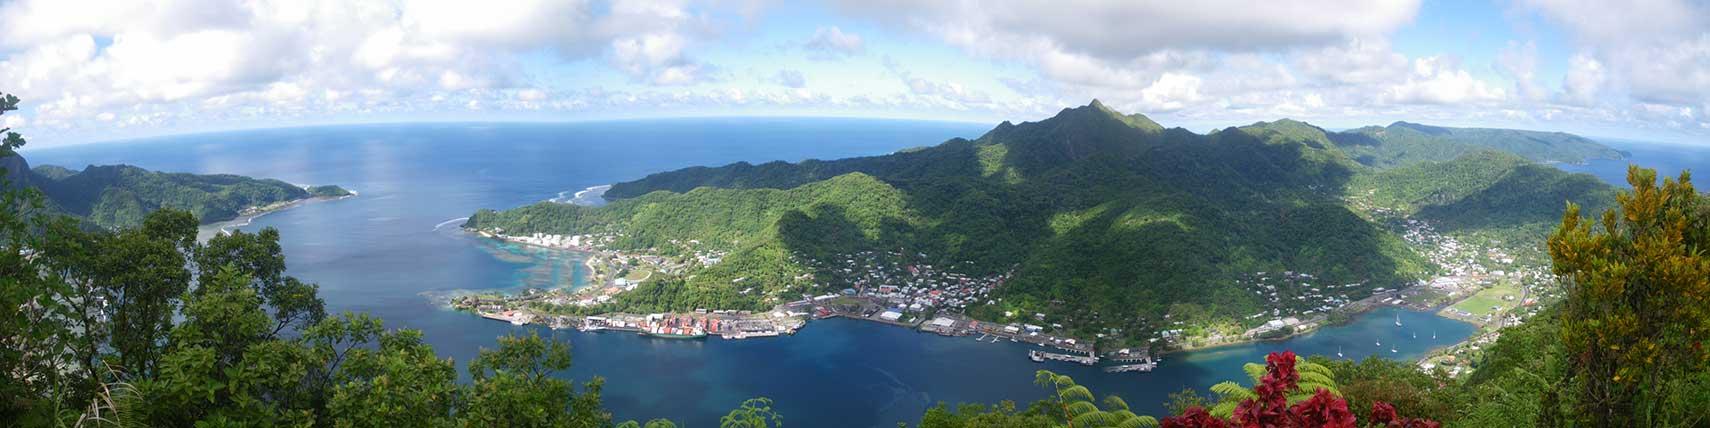 Google Map of Pago Pago Tutuila American Samoa  Nations Online